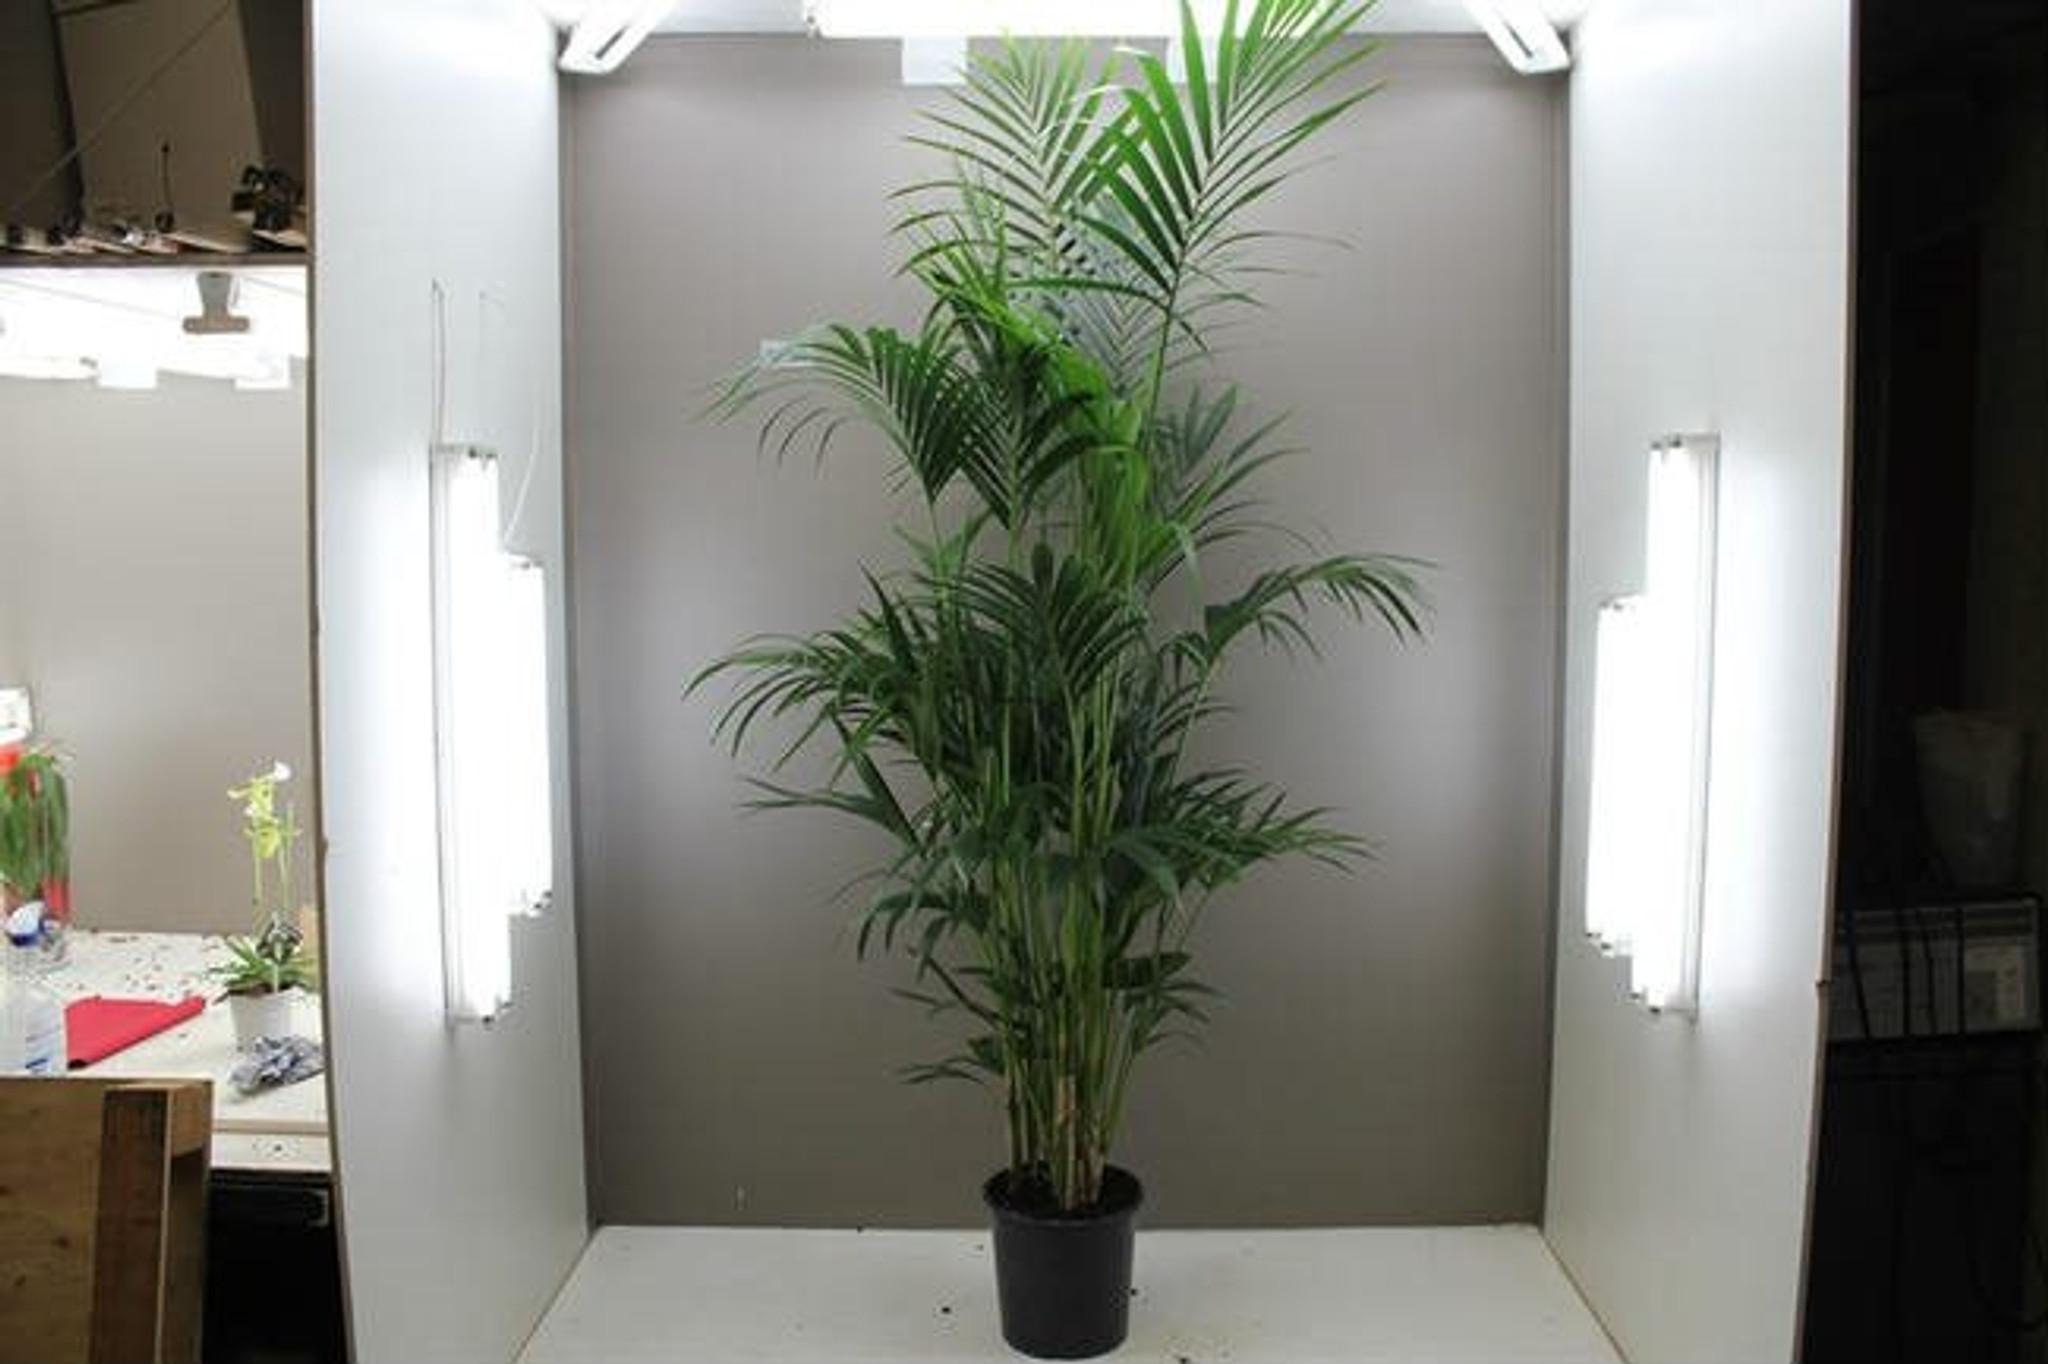 Kentia palm tree 2.2m